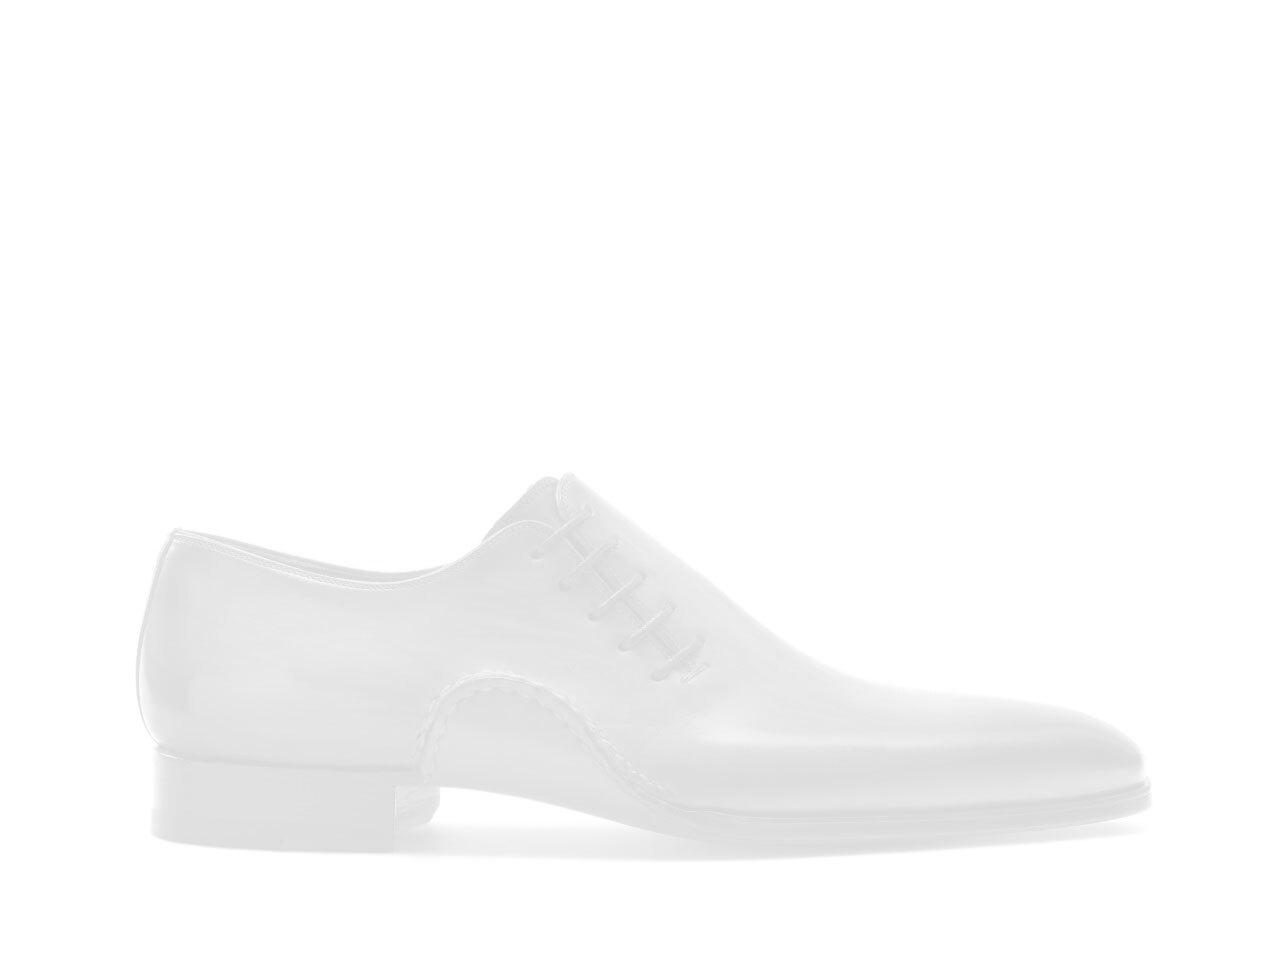 Nerja | White and Cuero